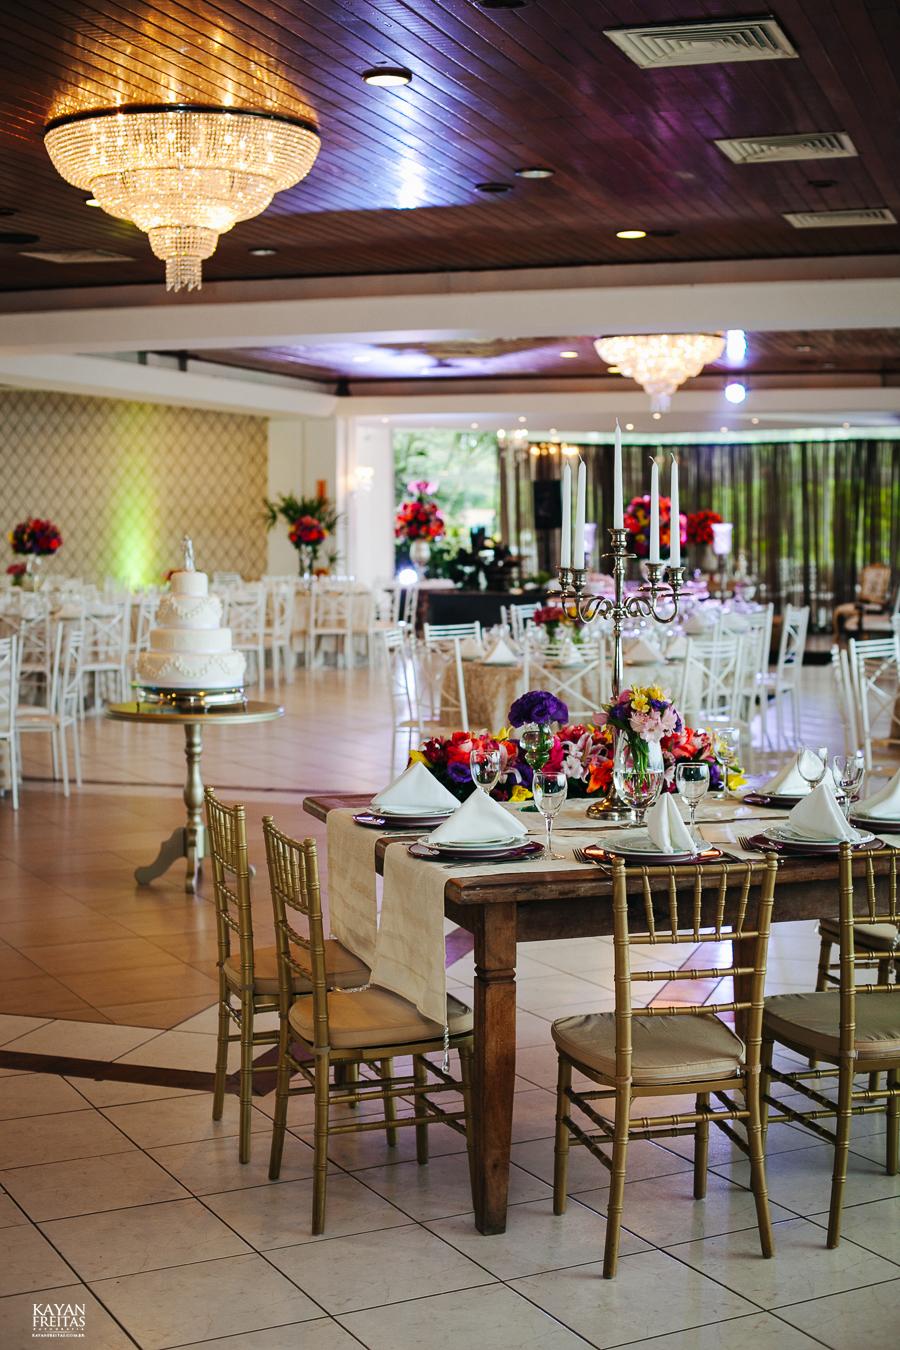 casamento-lic-cem-0027 Casamento Cecilia e Marcelo - LIC Florianópolis